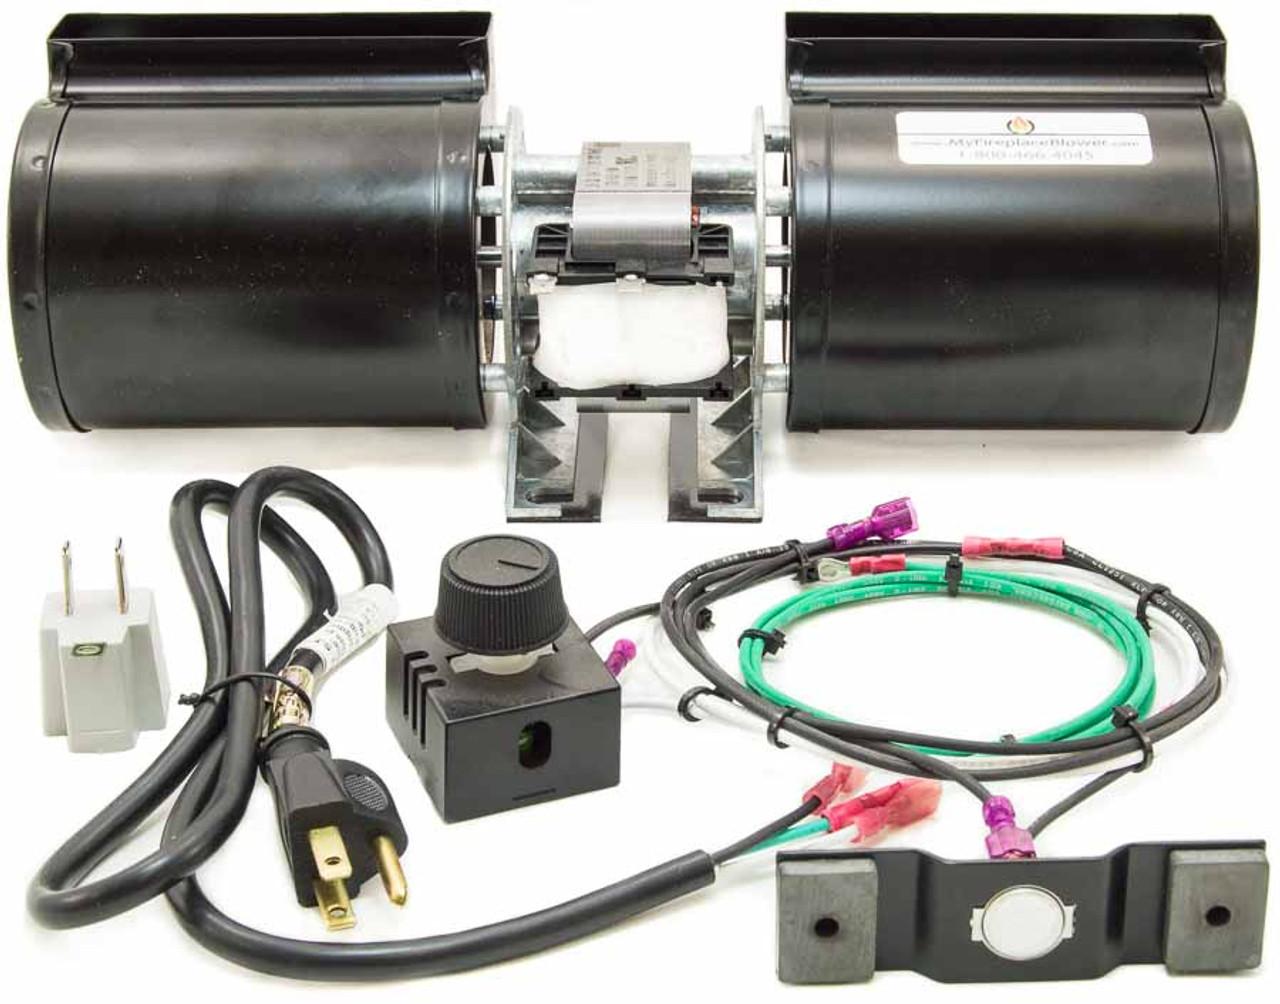 Gfk 160a Heat Amp Glo Fireplace Blower Kit 6000tr